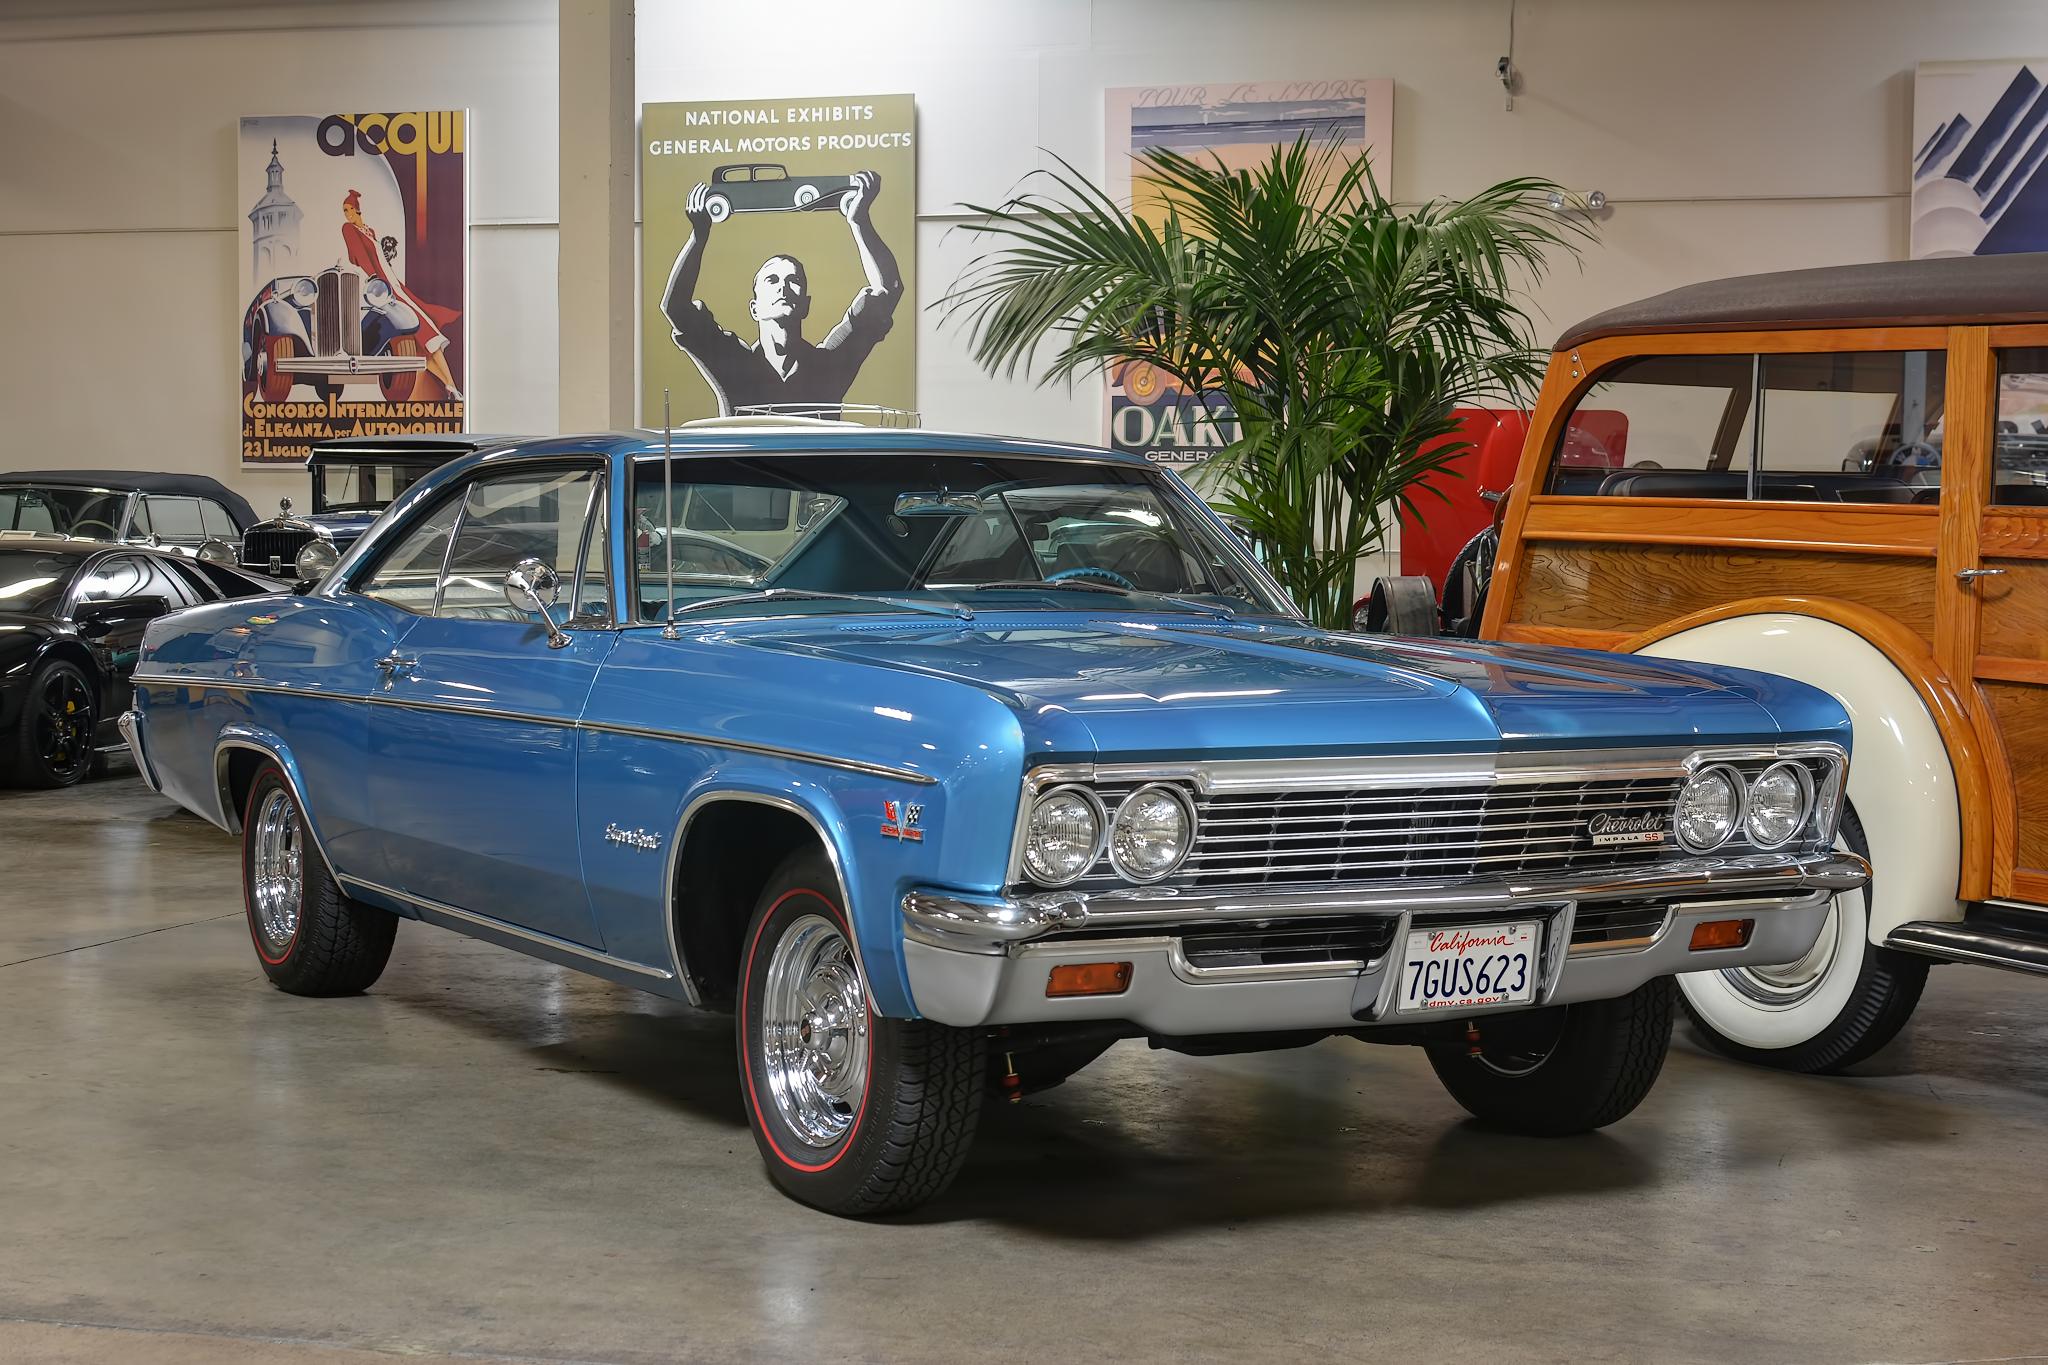 1966 chevrolet impala ss 427 sport coupe flickr photo sharing. Black Bedroom Furniture Sets. Home Design Ideas